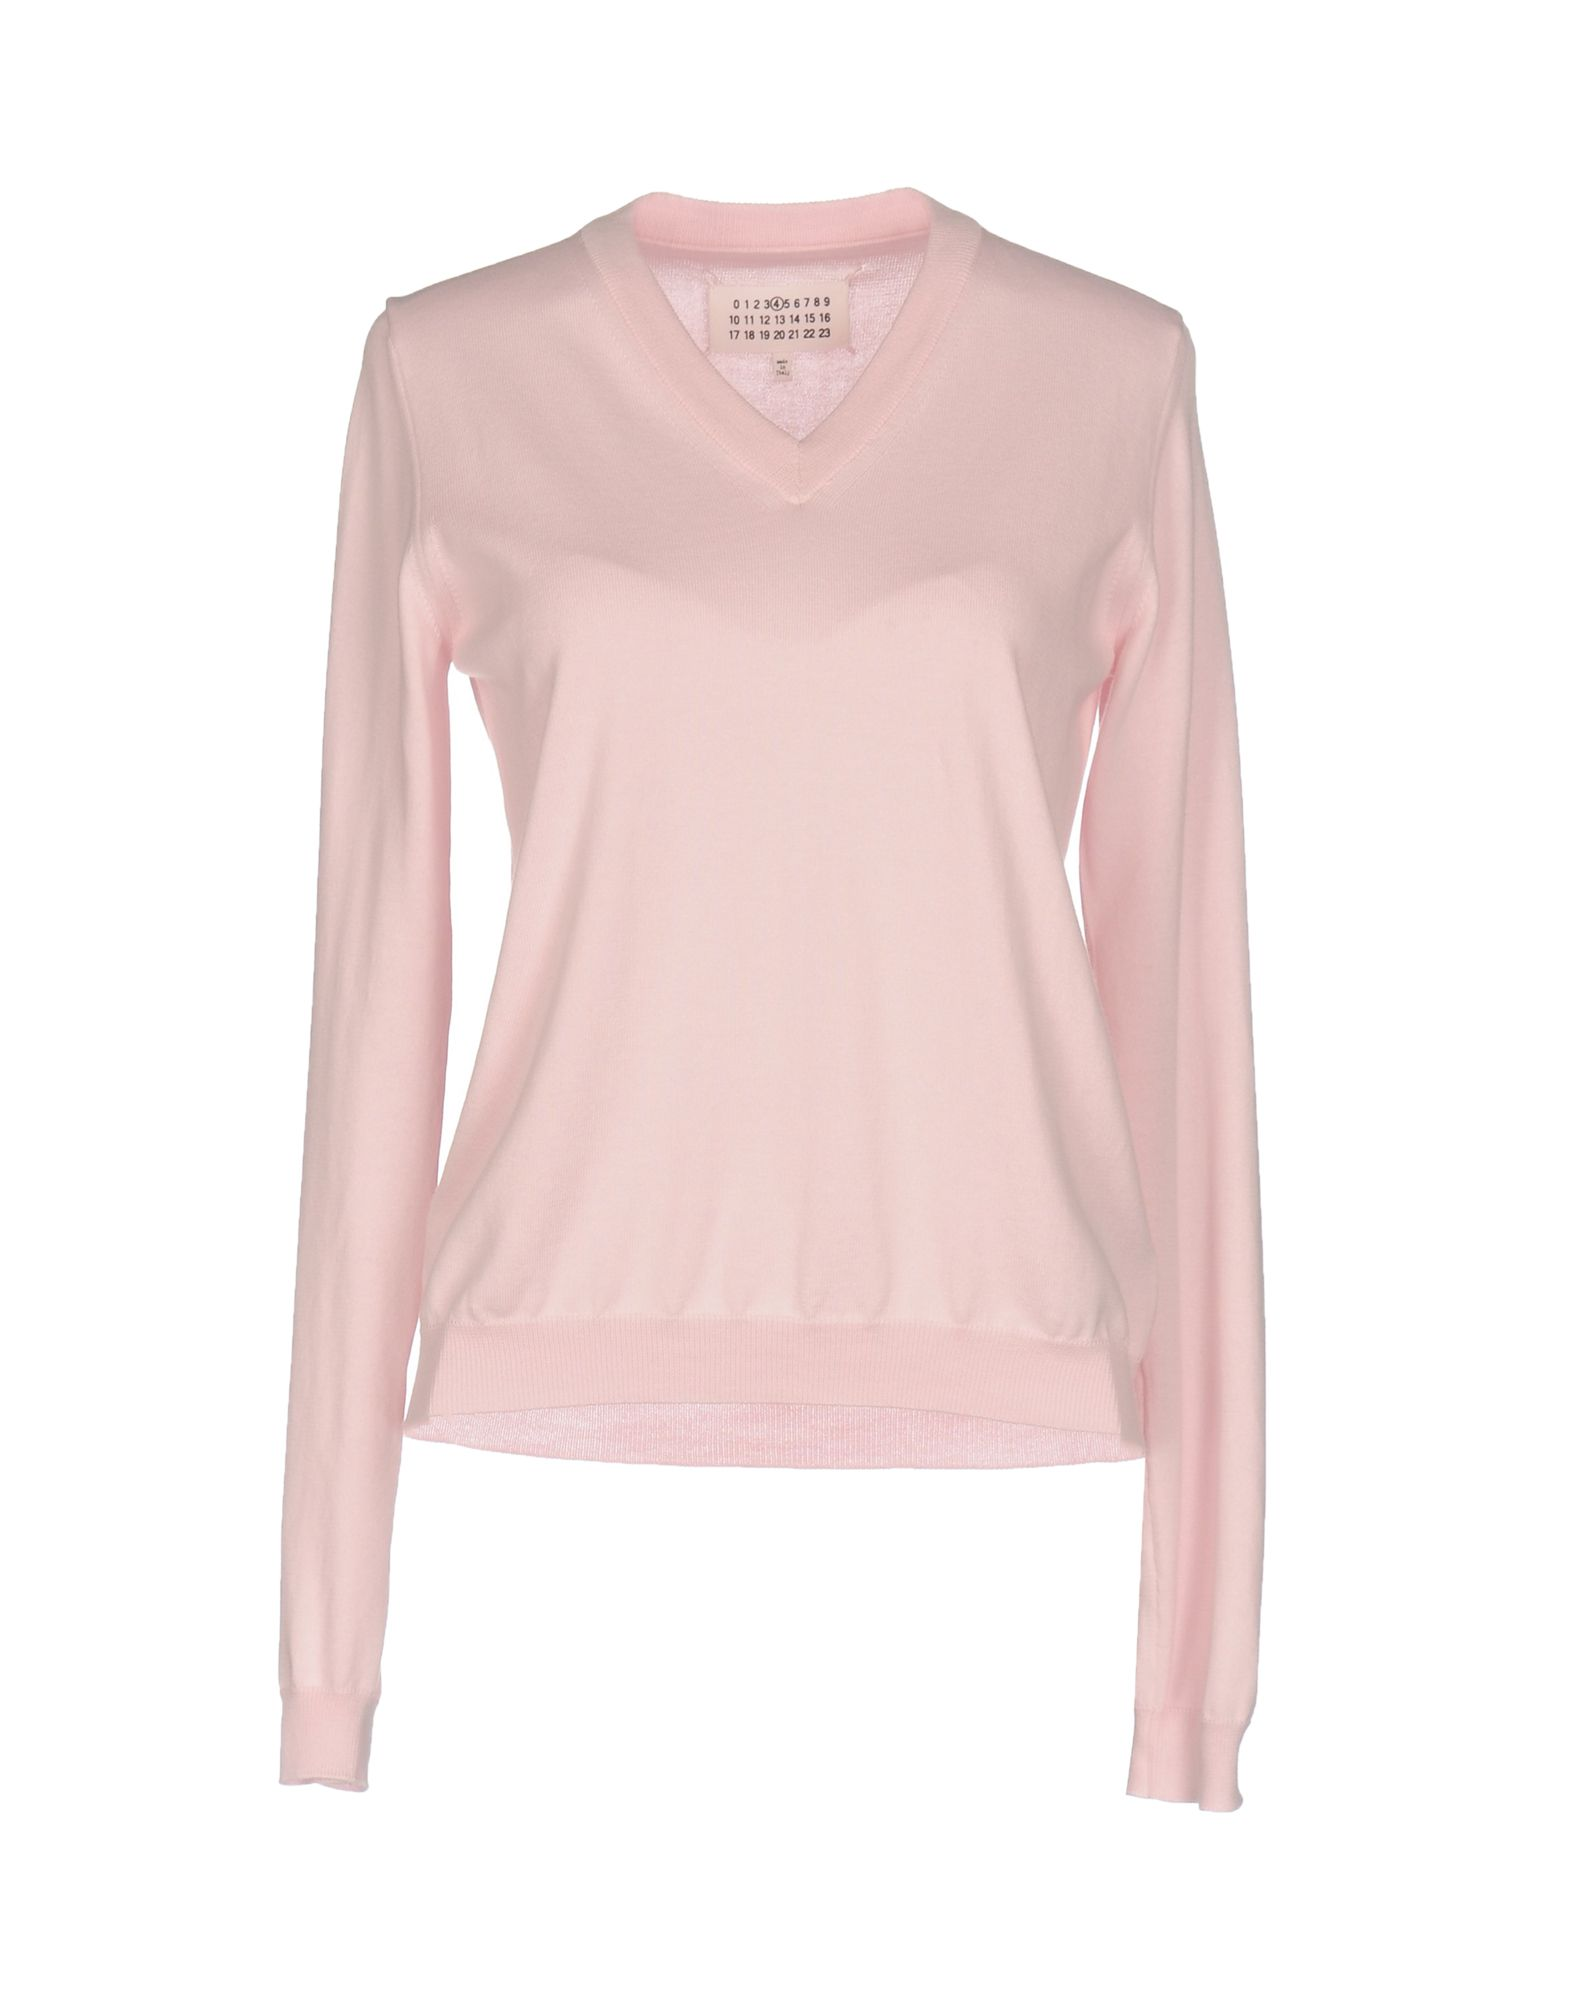 Pullover Maison Margiela Donna - Acquista online su 6mvuqFB0z4